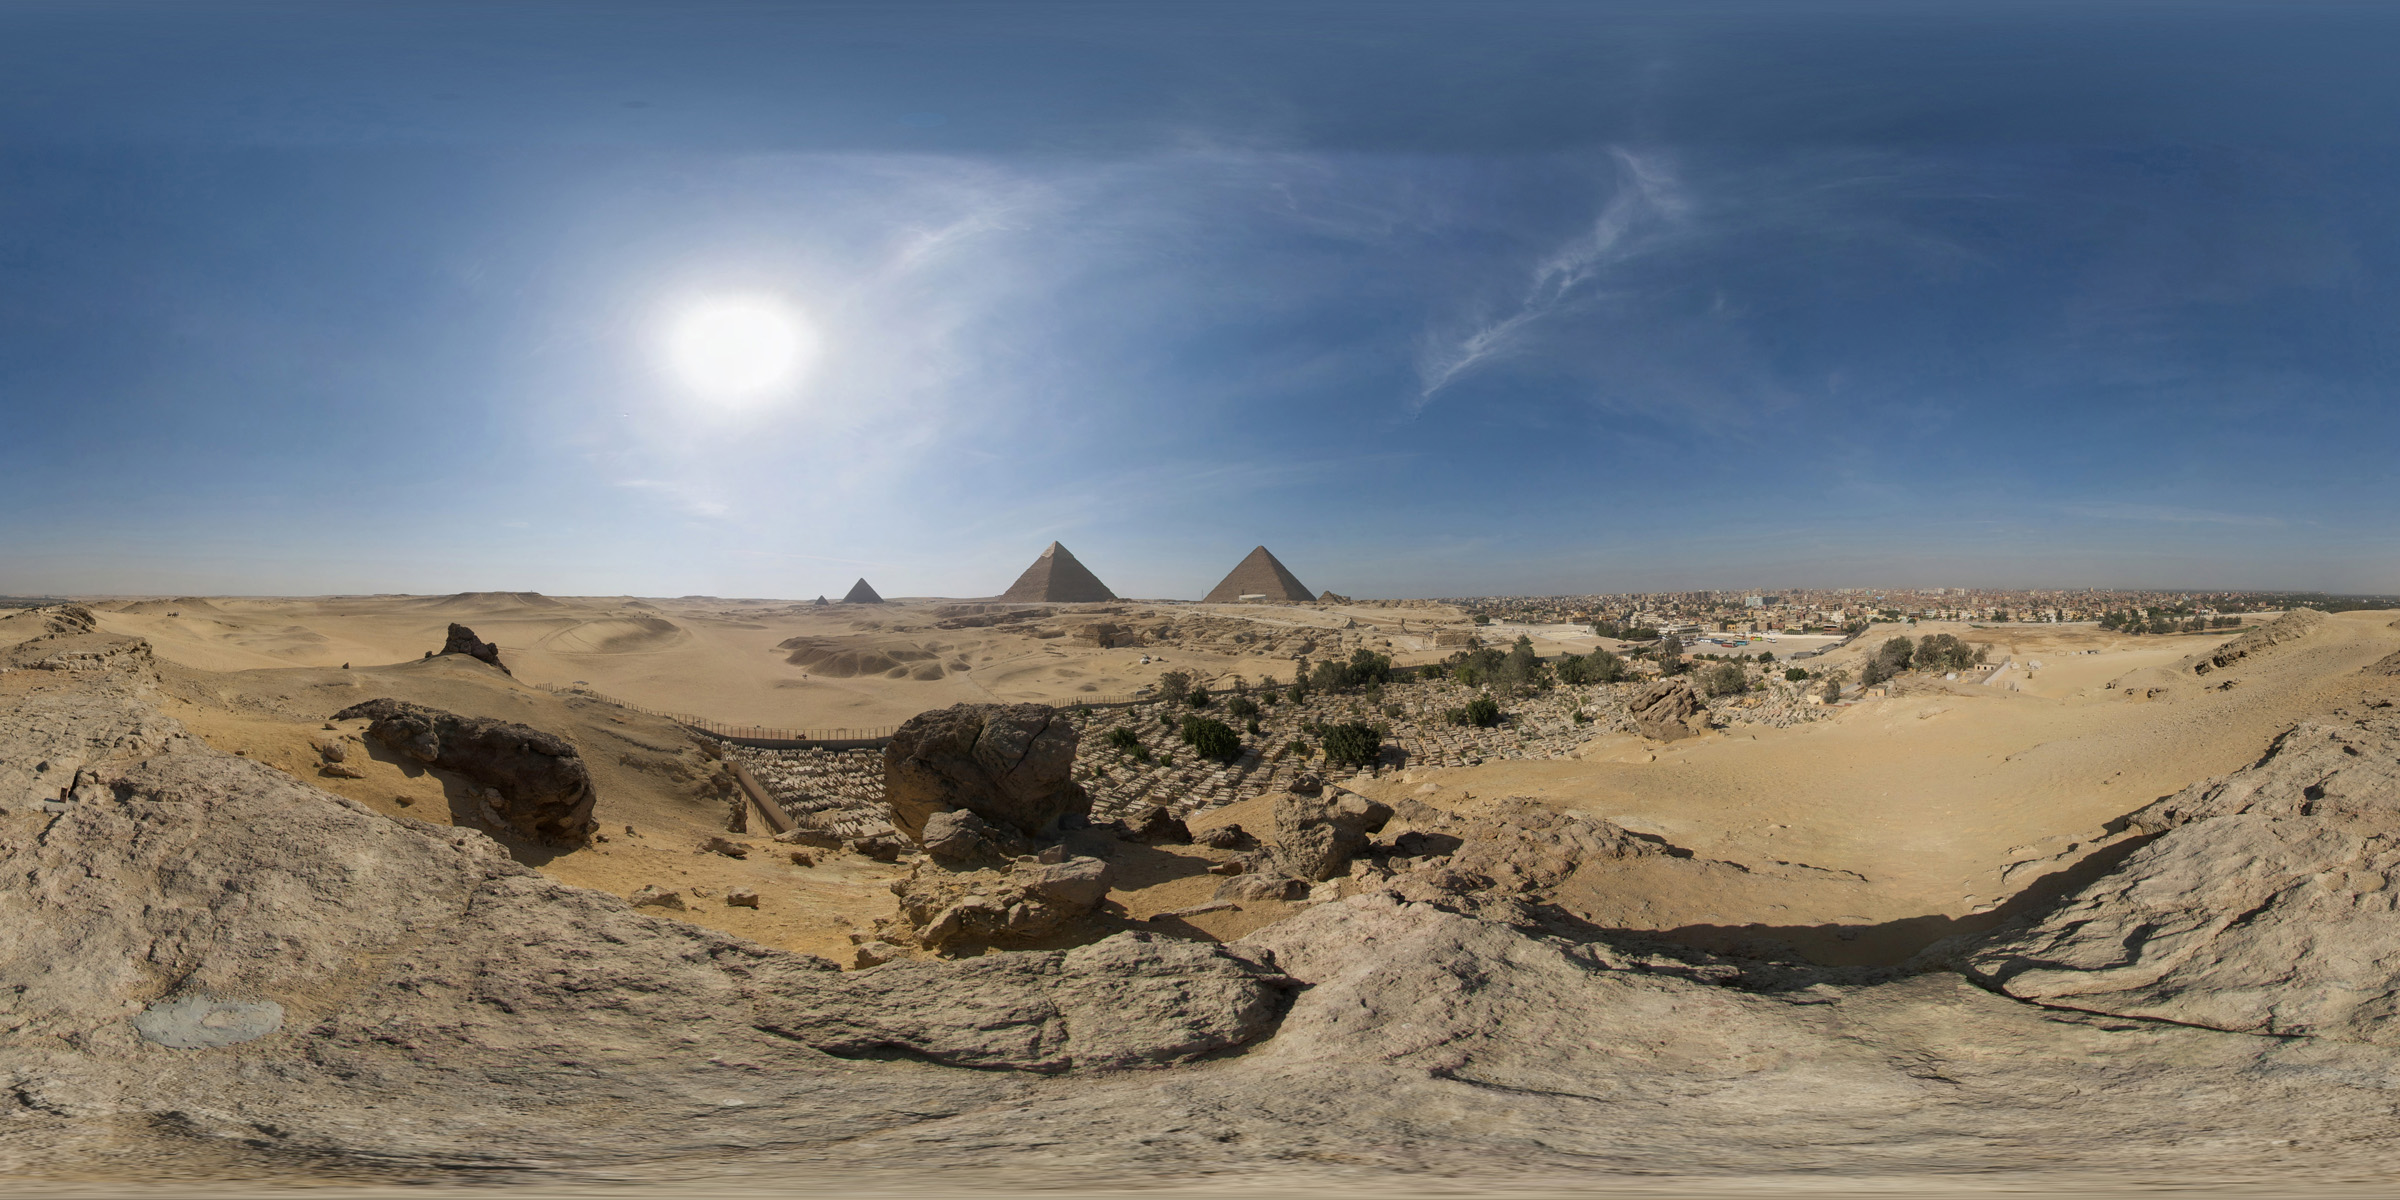 Giza Pyramids, Egypt - by Jason Quinlan